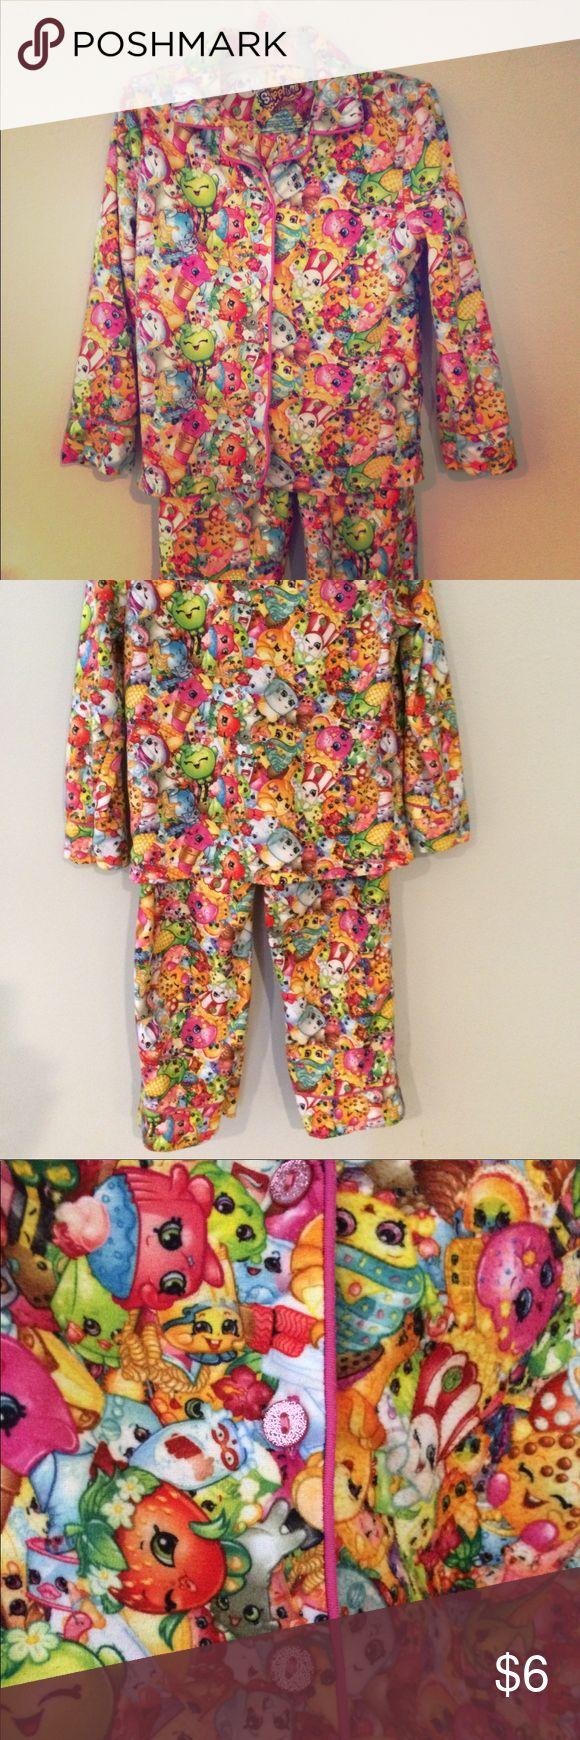 Shopkins Pajamas Long sleeved shirt and pants Shopkins pajamas. Shirt is collared and buttons up the front with pink sparkly buttons. Elastic waistband. Pajamas Pajama Sets